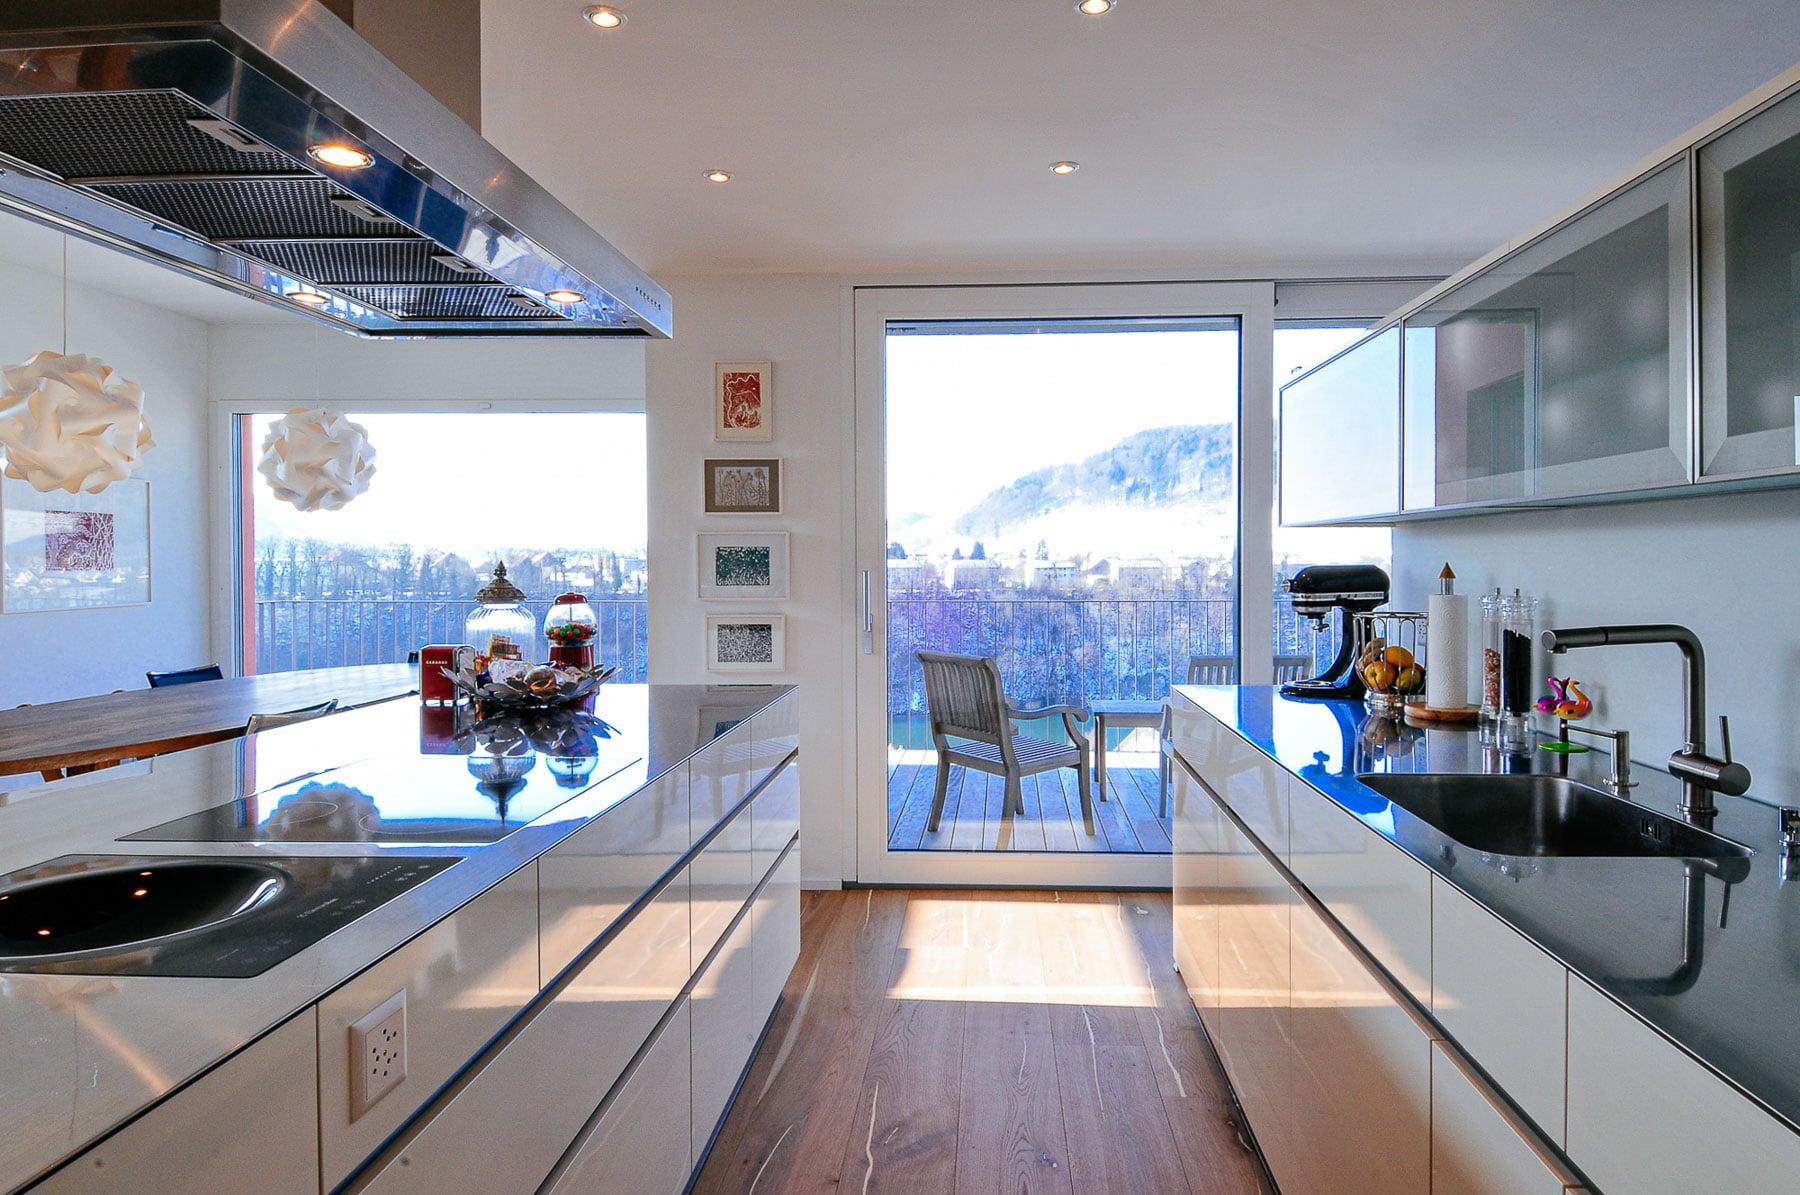 11-Küche–bearbeitet